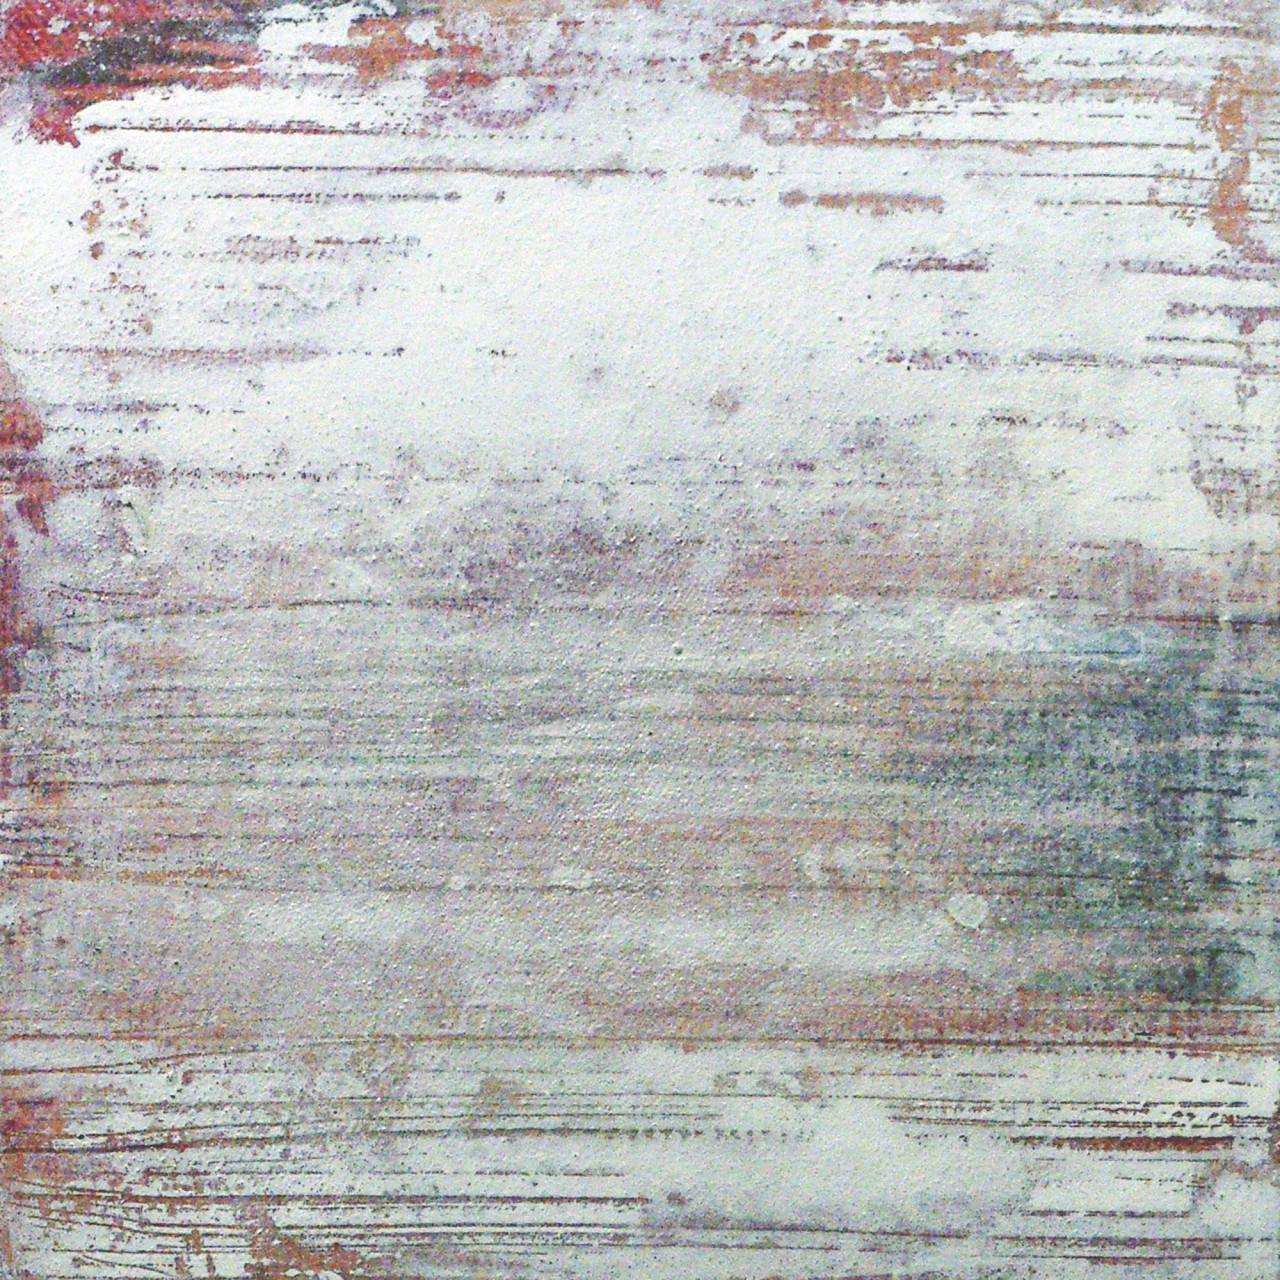 623.3, 2015 tecnica mista su tavola 23x23 cm